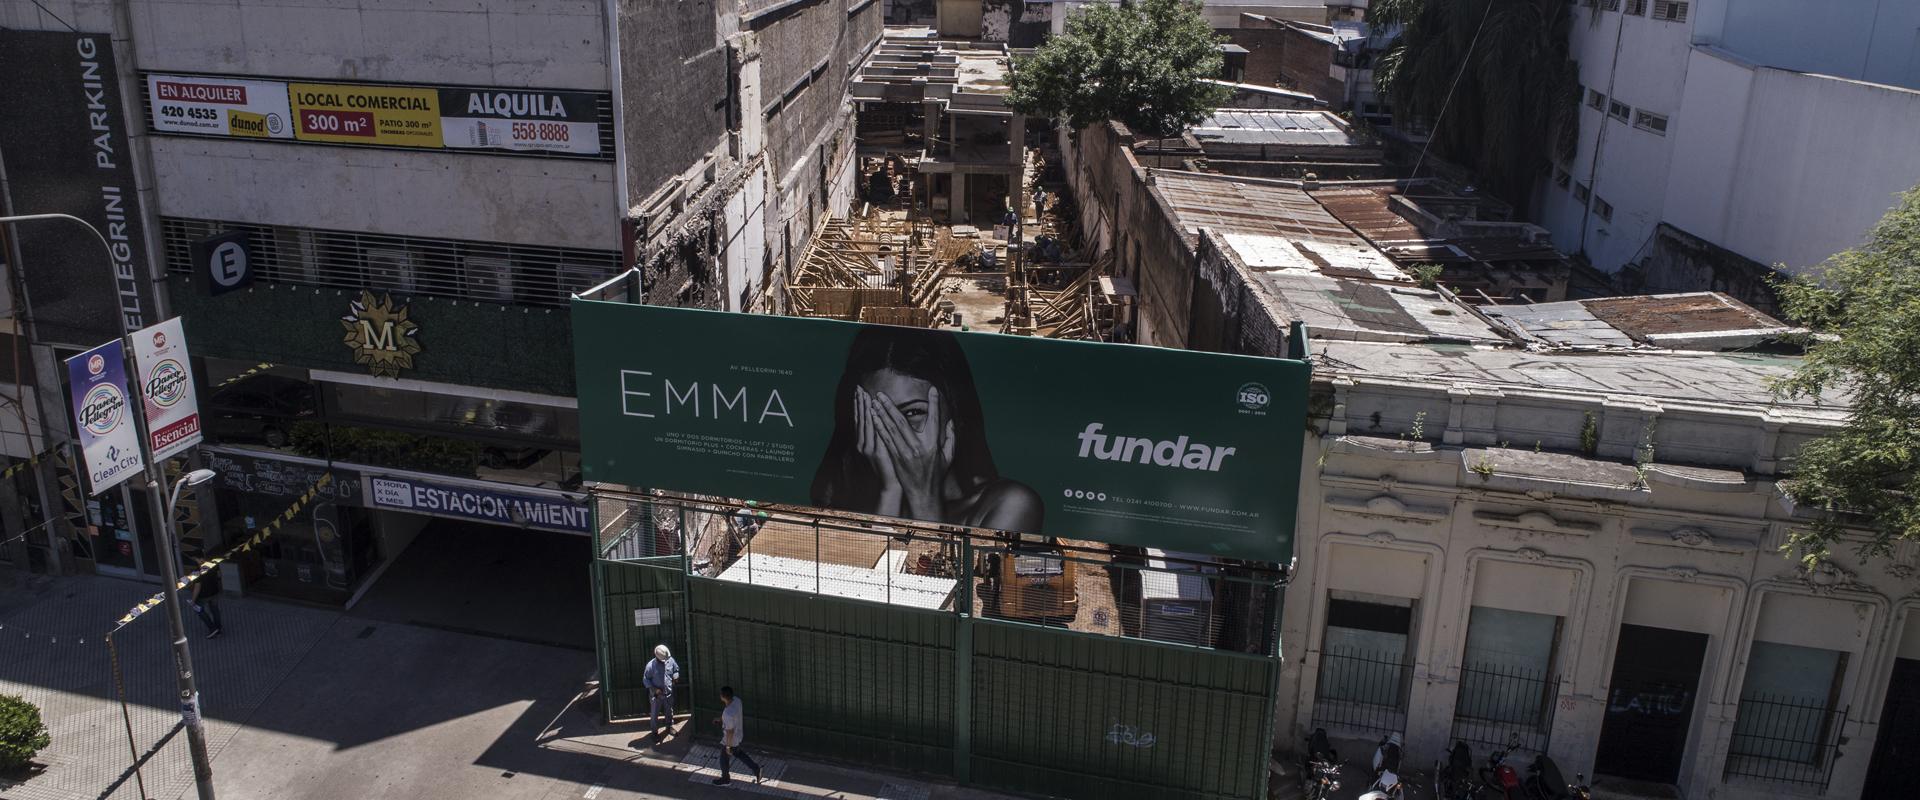 Emma - Enero 2020 Avance de Obra